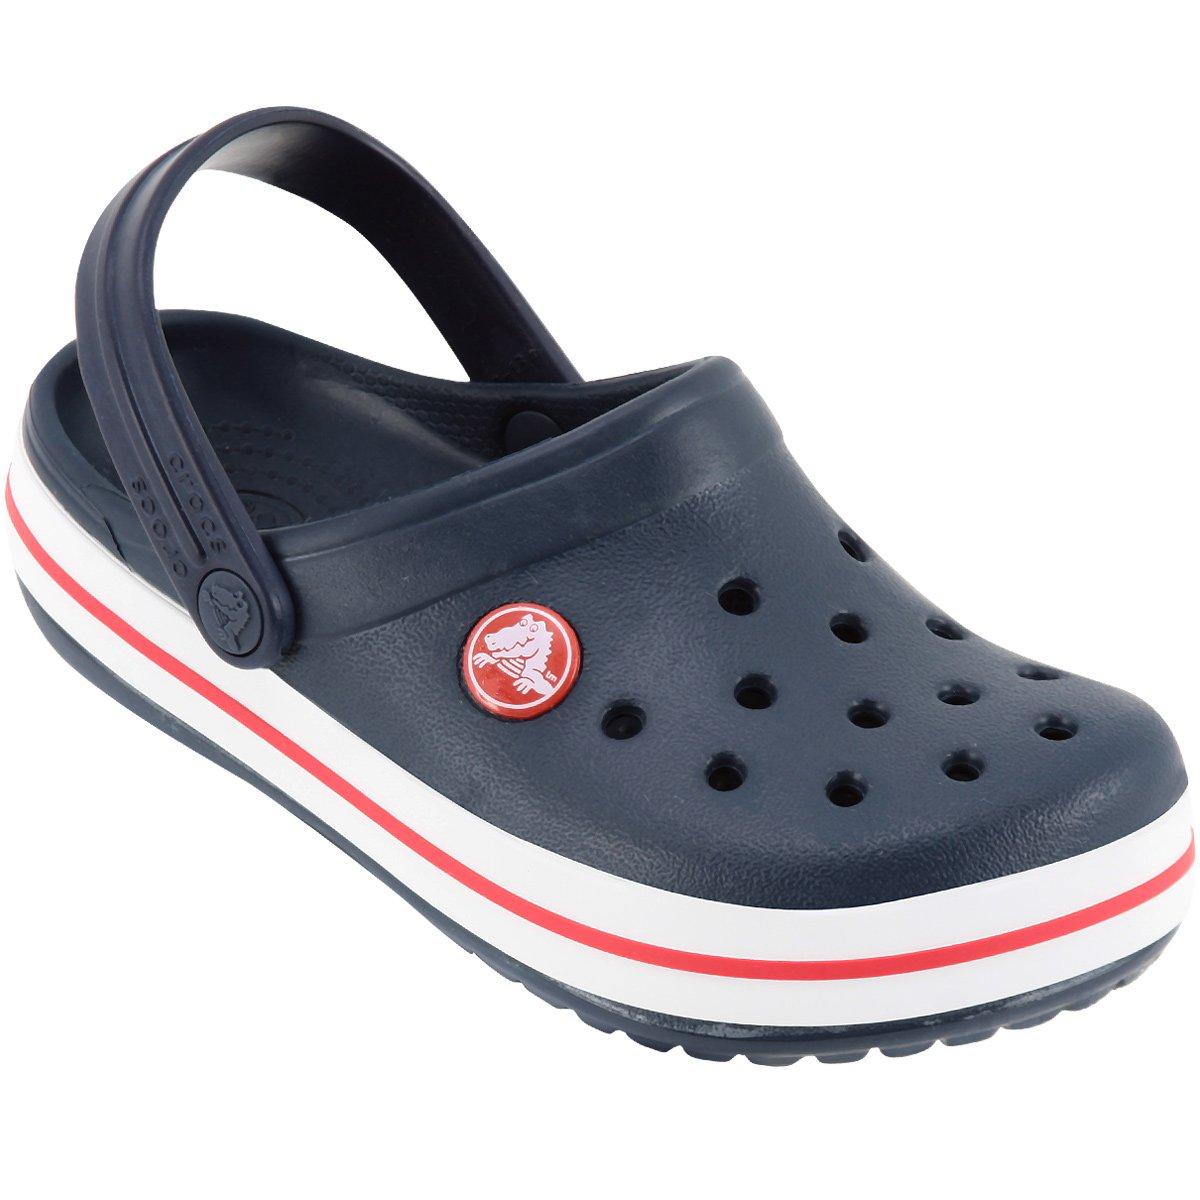 5a61c1b1b Sandália Infantil Crocs Crocband